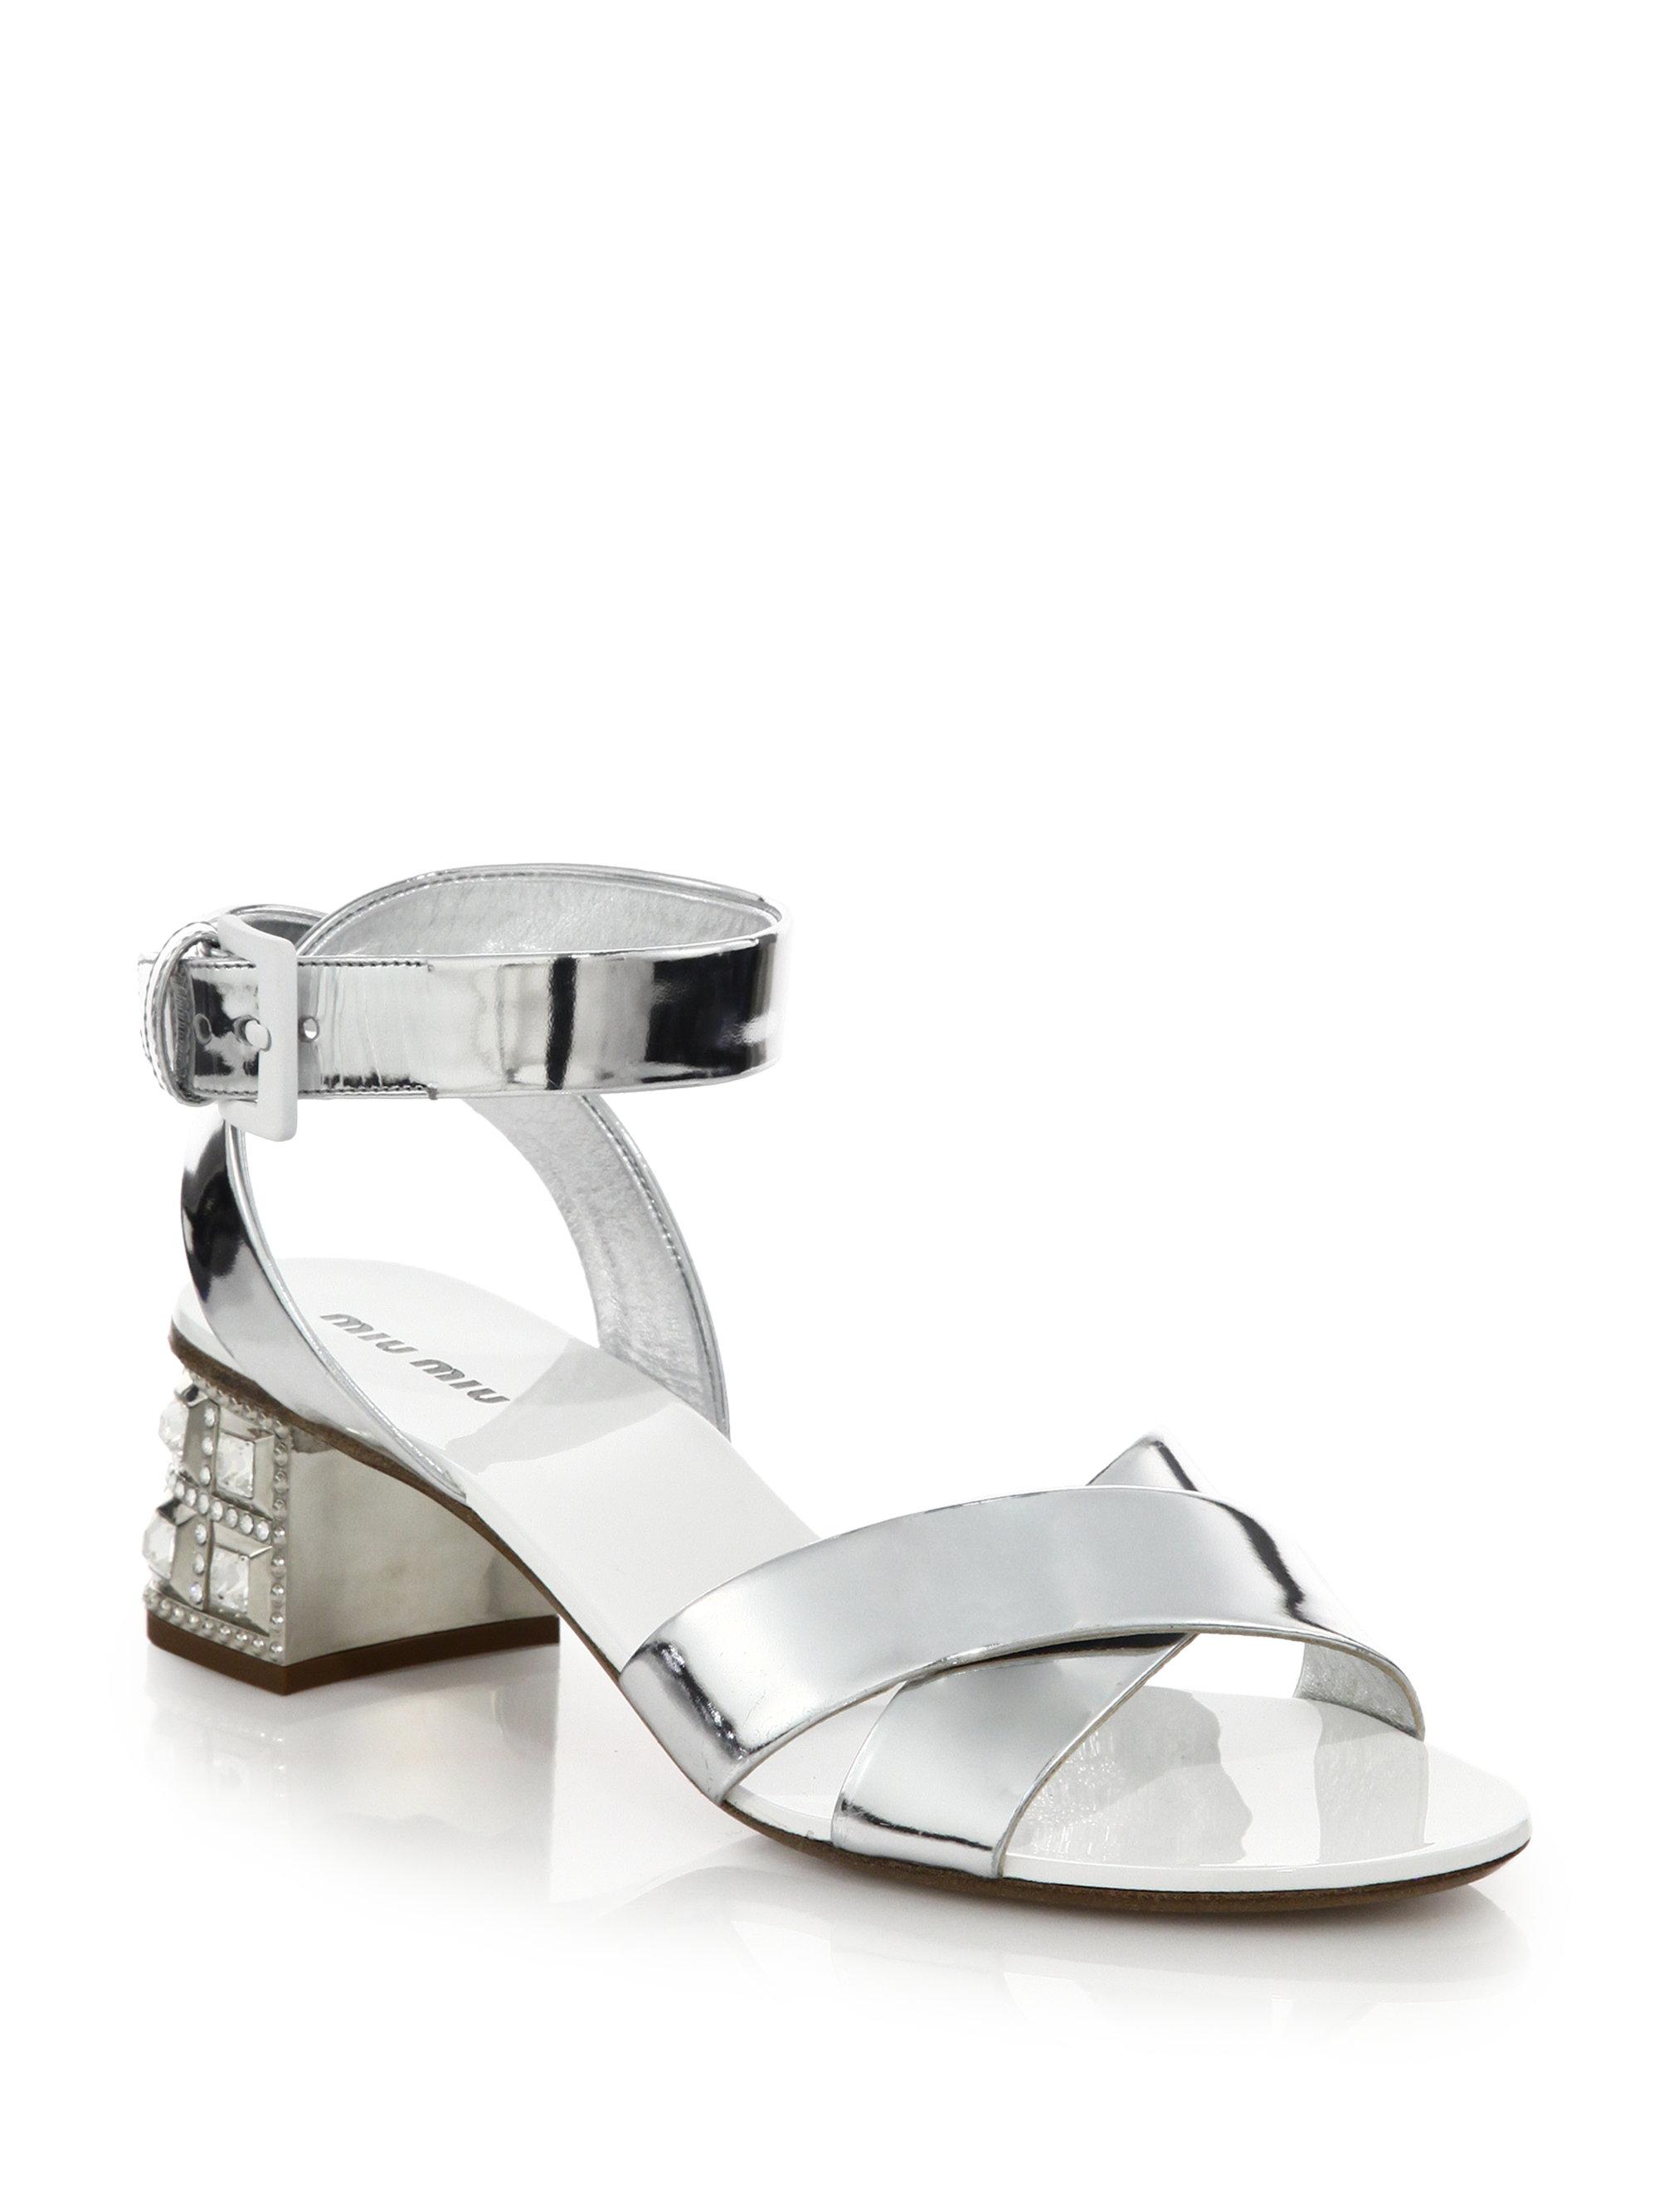 lyst miu miu jeweled heel sandals in metallic. Black Bedroom Furniture Sets. Home Design Ideas